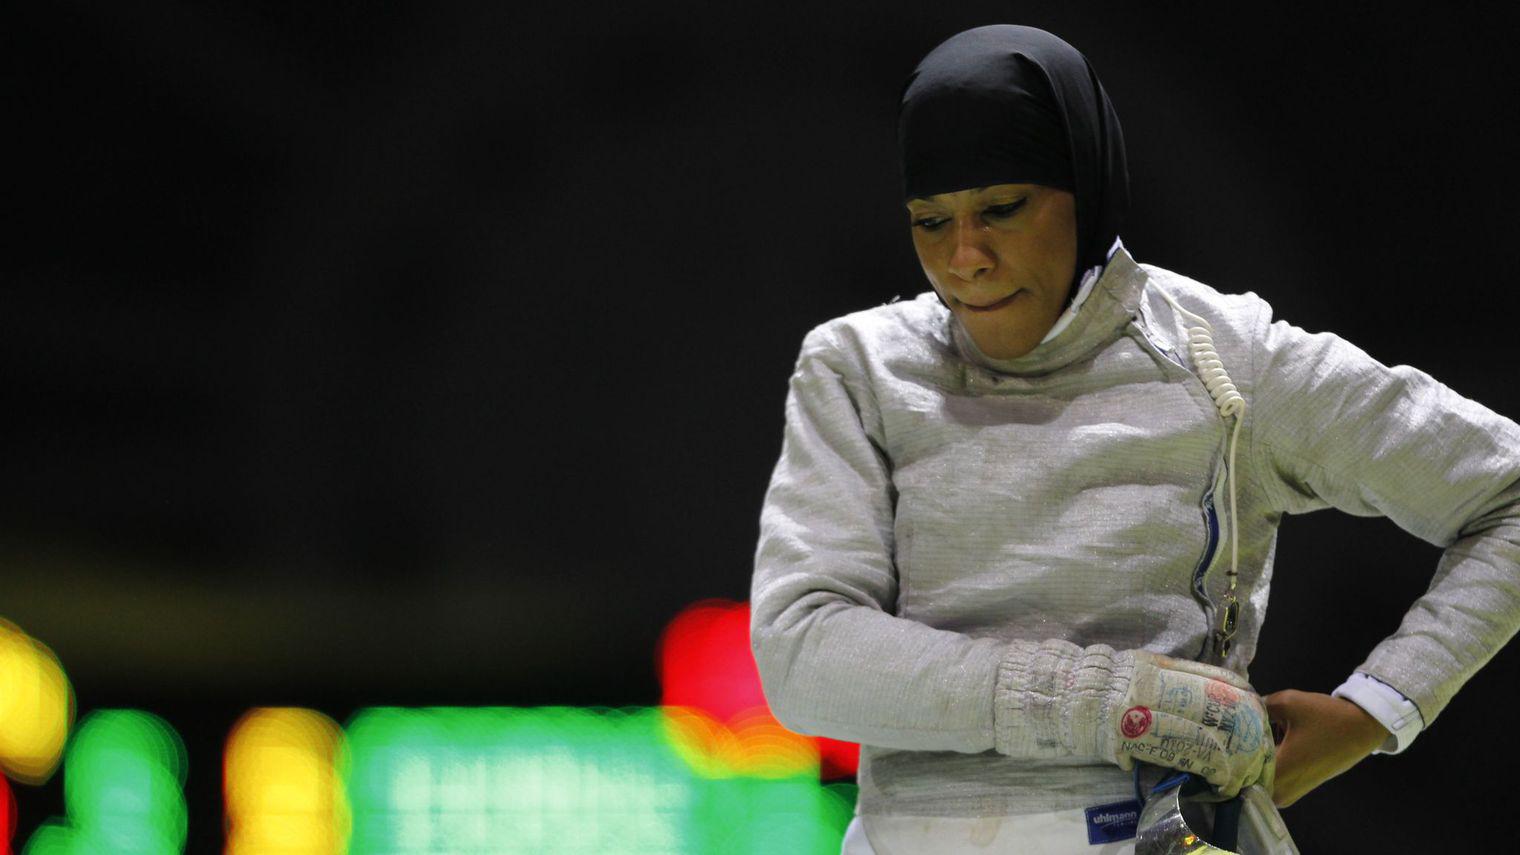 Première Athlète américaine à porter un Hijab au JO2